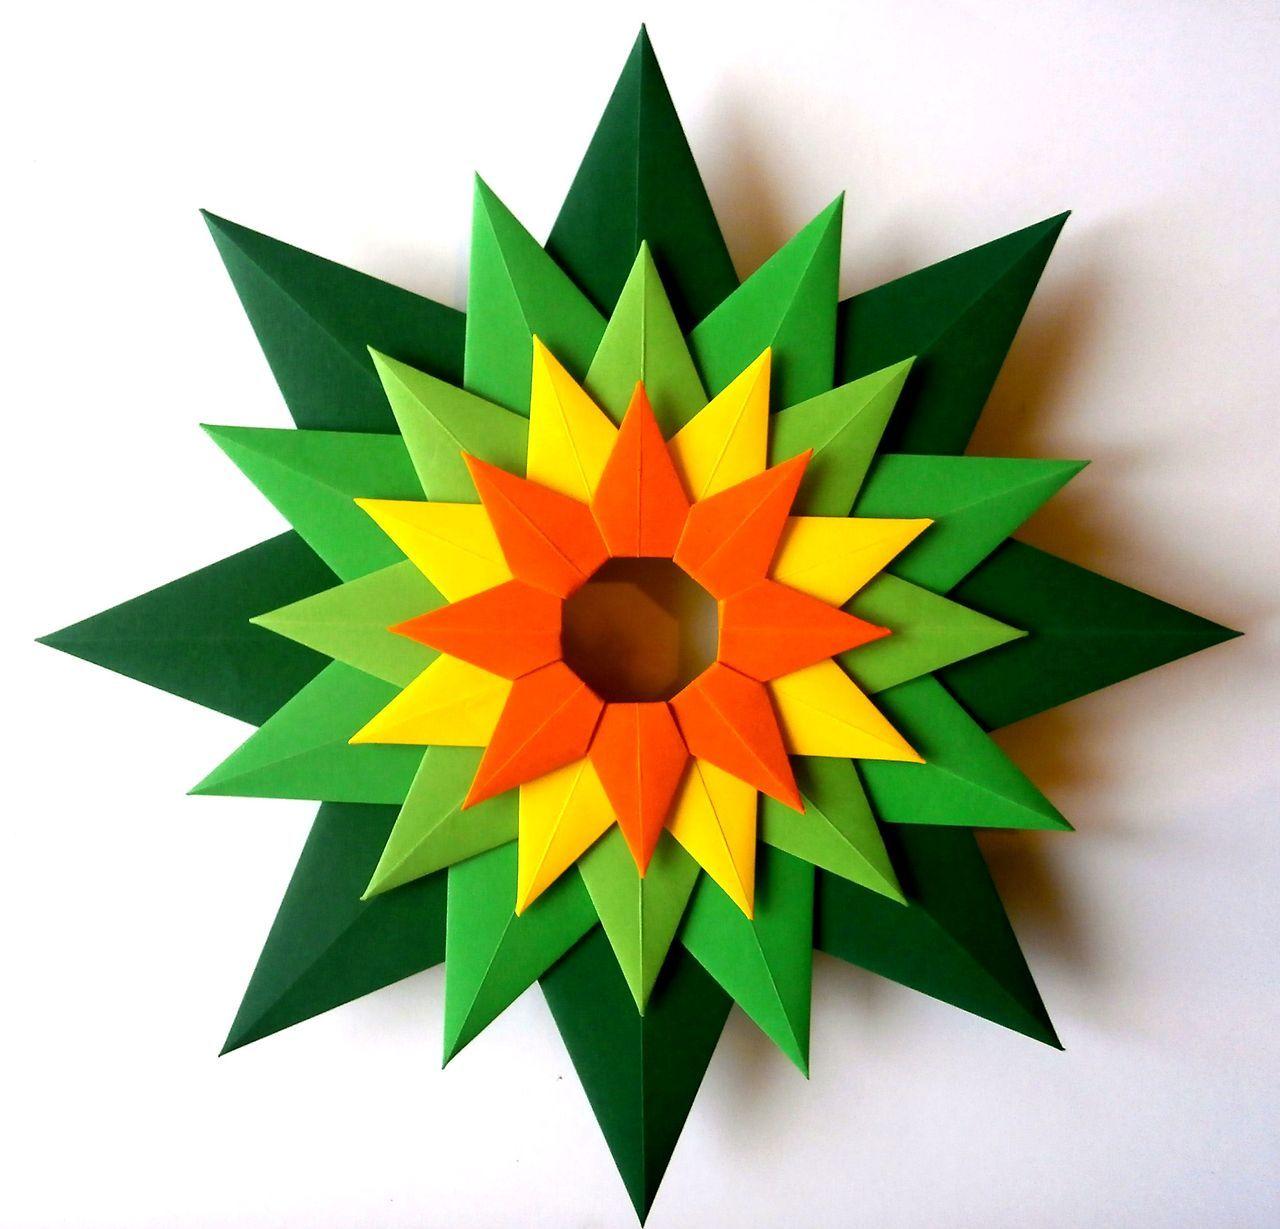 Stella Veneziana Designed By Paolo Bascetta Folded Vlatka Fric